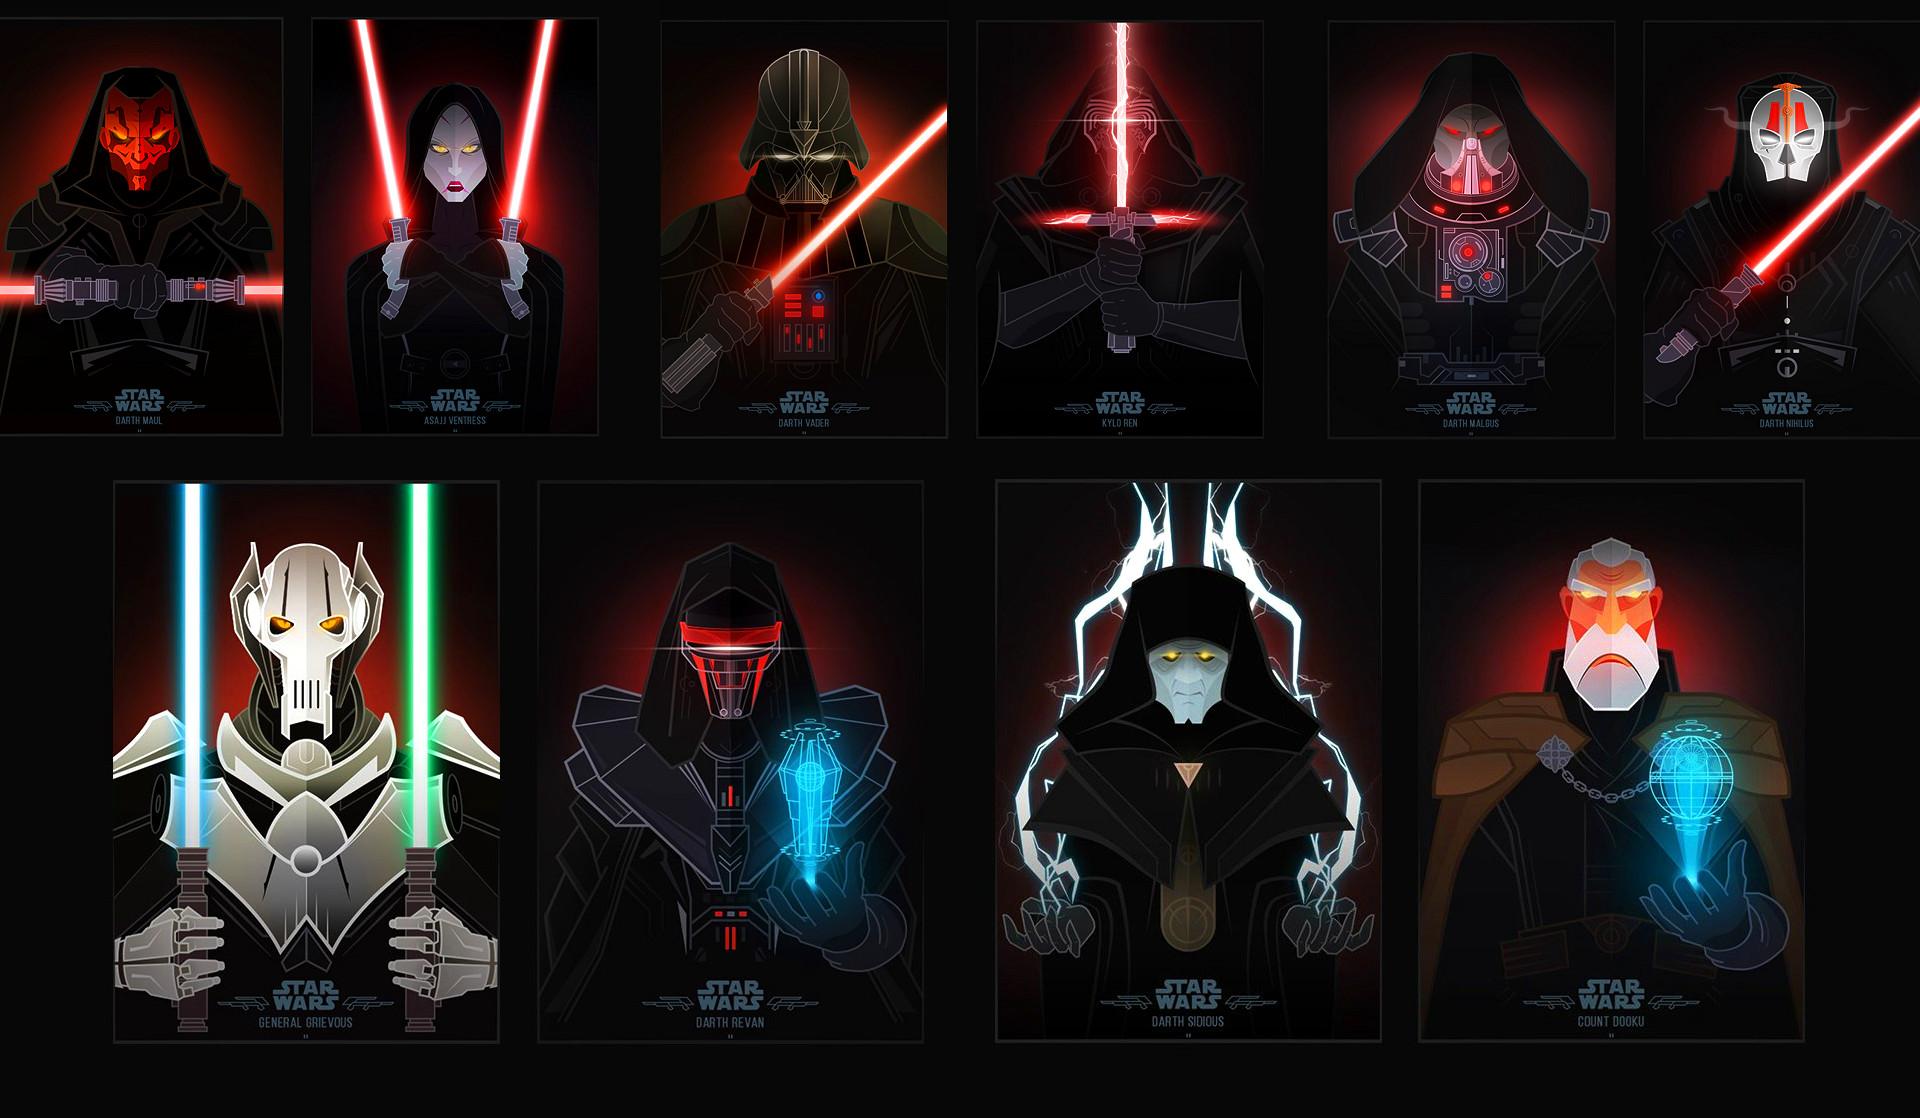 Jedi vs Sith HD Wallpaper | Wallpapers | Pinterest | Sith and Hd wallpaper